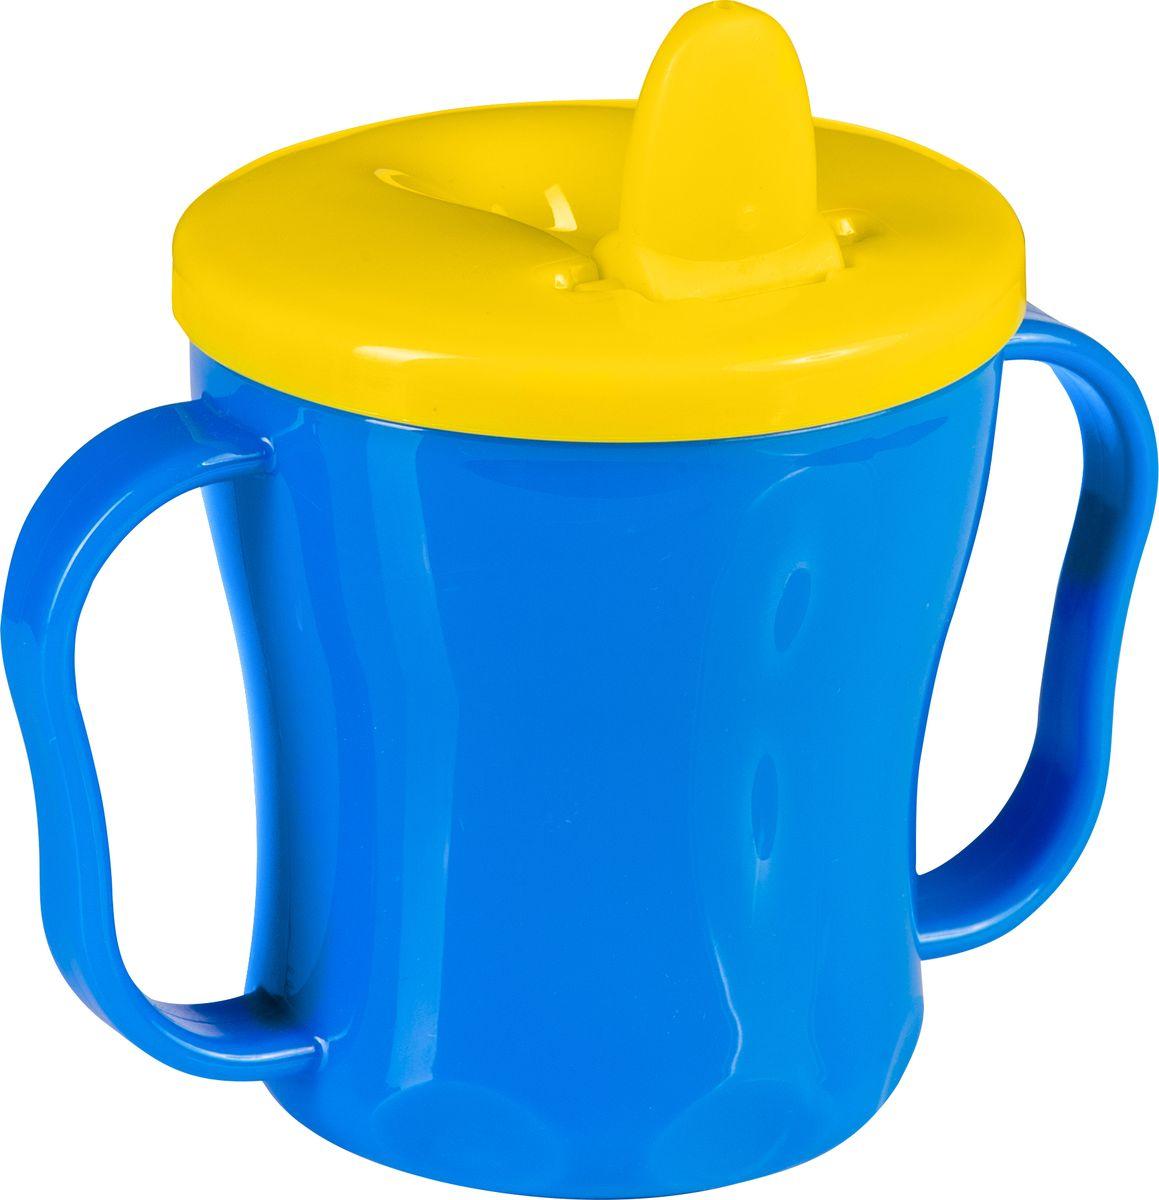 BabyOno Поильник-непроливайка от 6 месяцев цвет синий желтый 180 мл